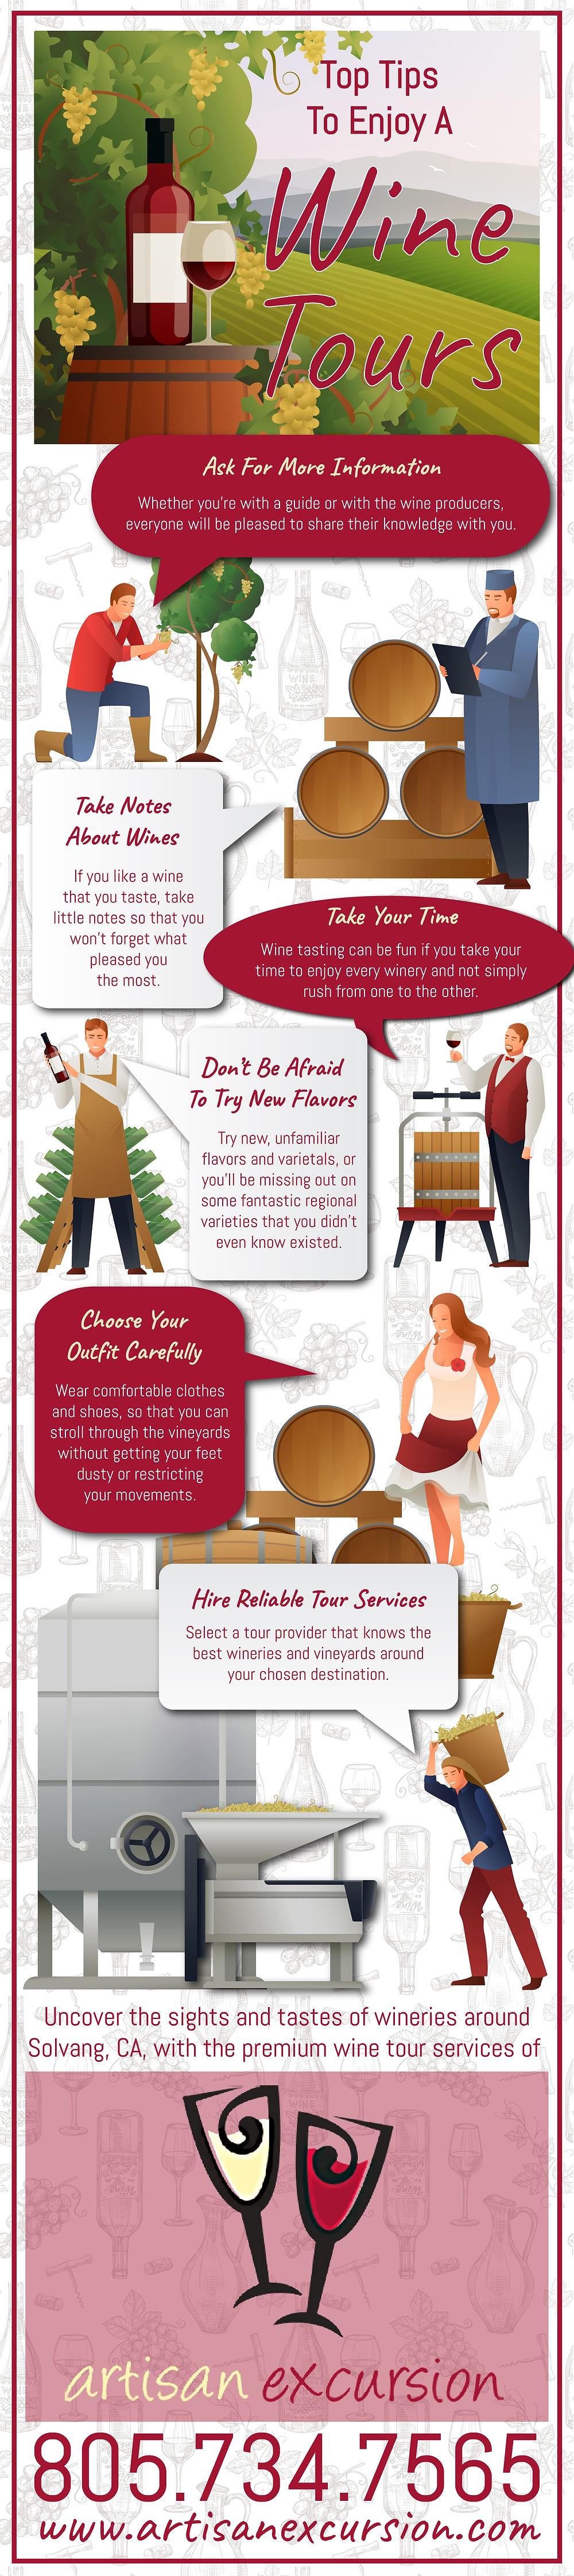 wine tour tips